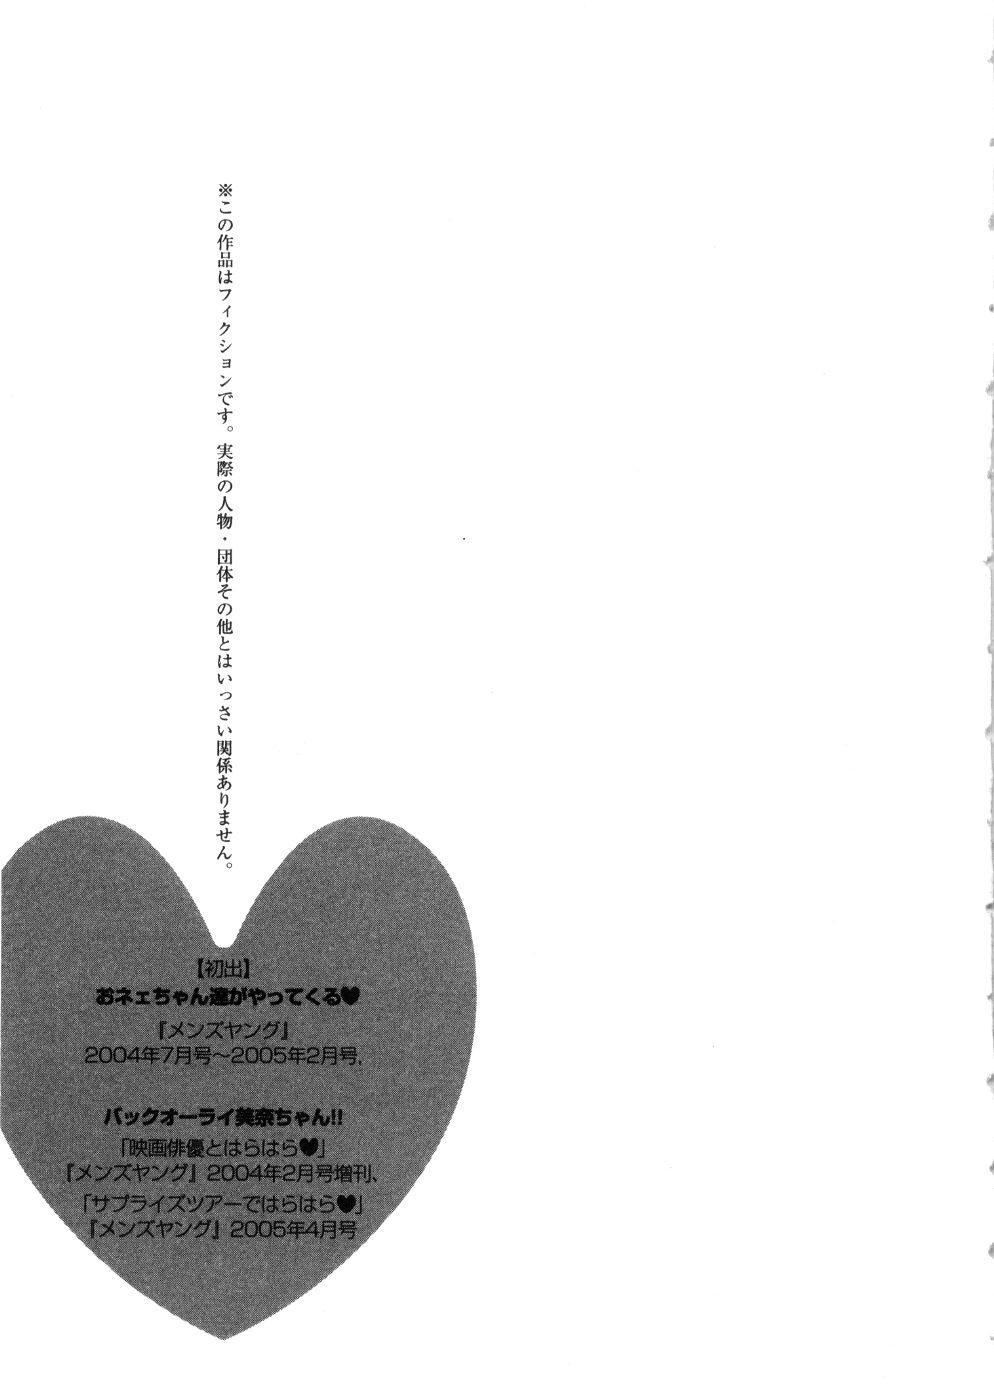 Oneechan-tachi ga Yatte Kuru 03 194